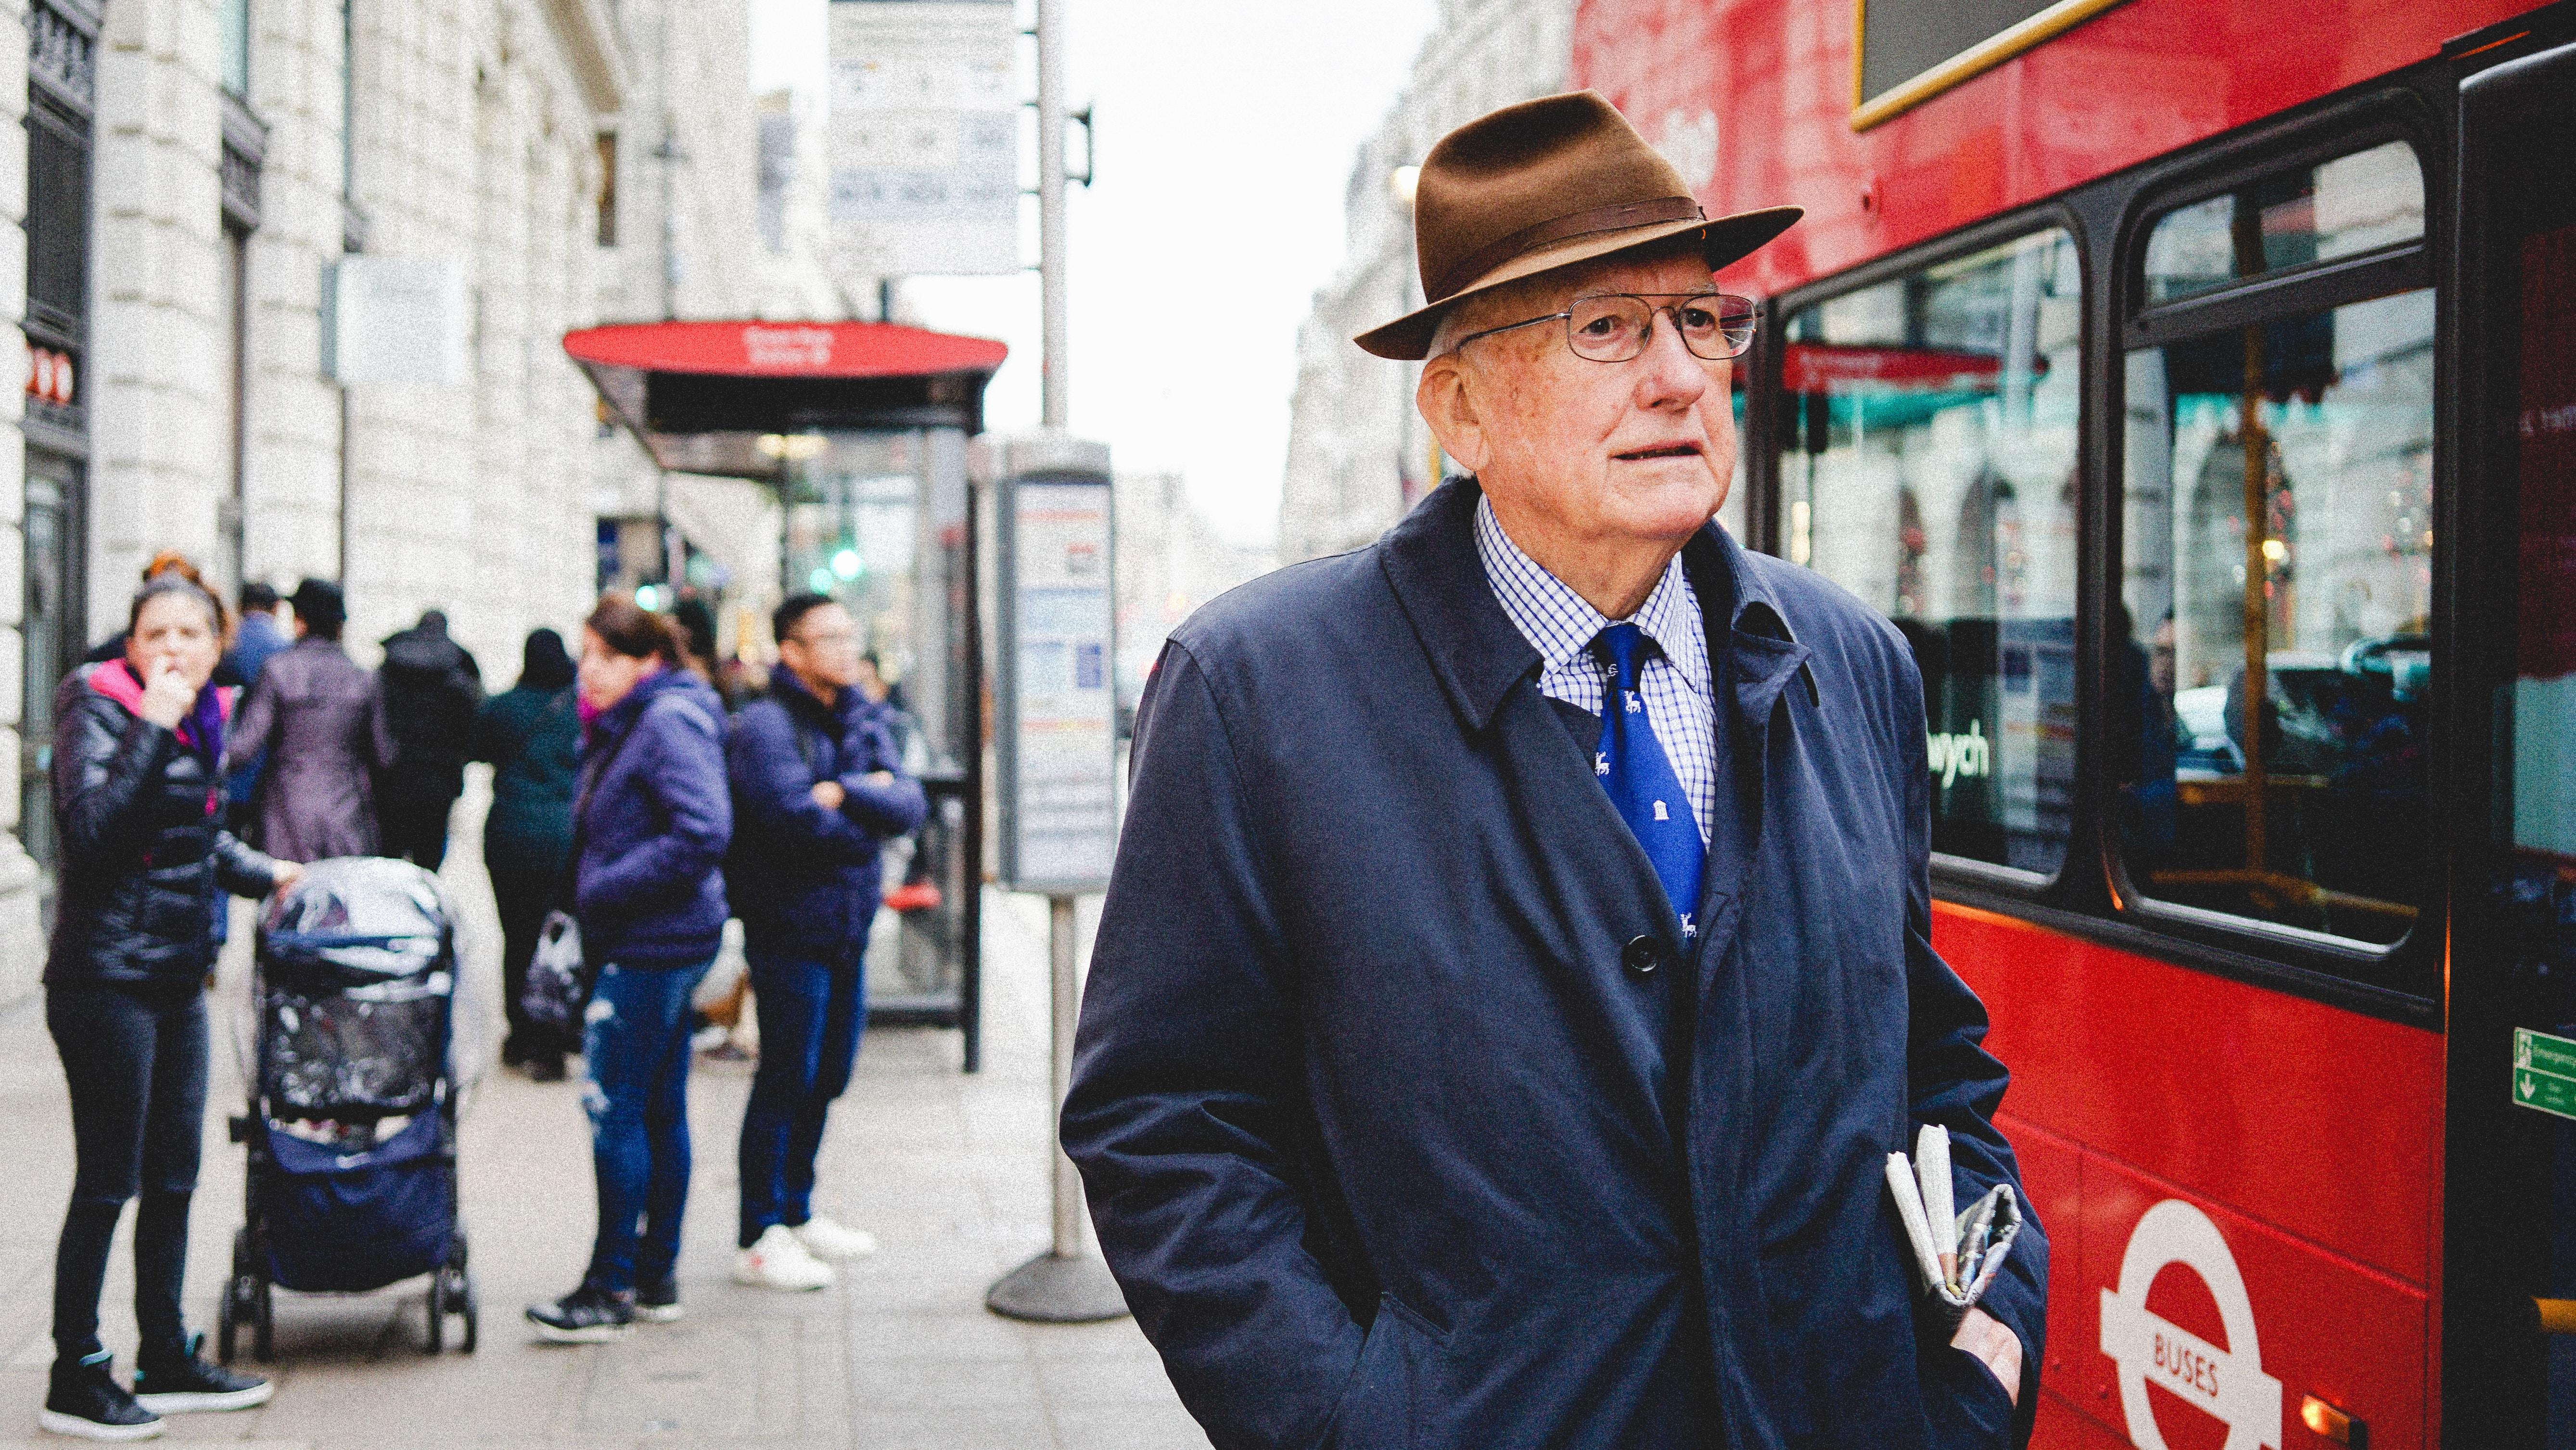 man standing near red bus at daytime